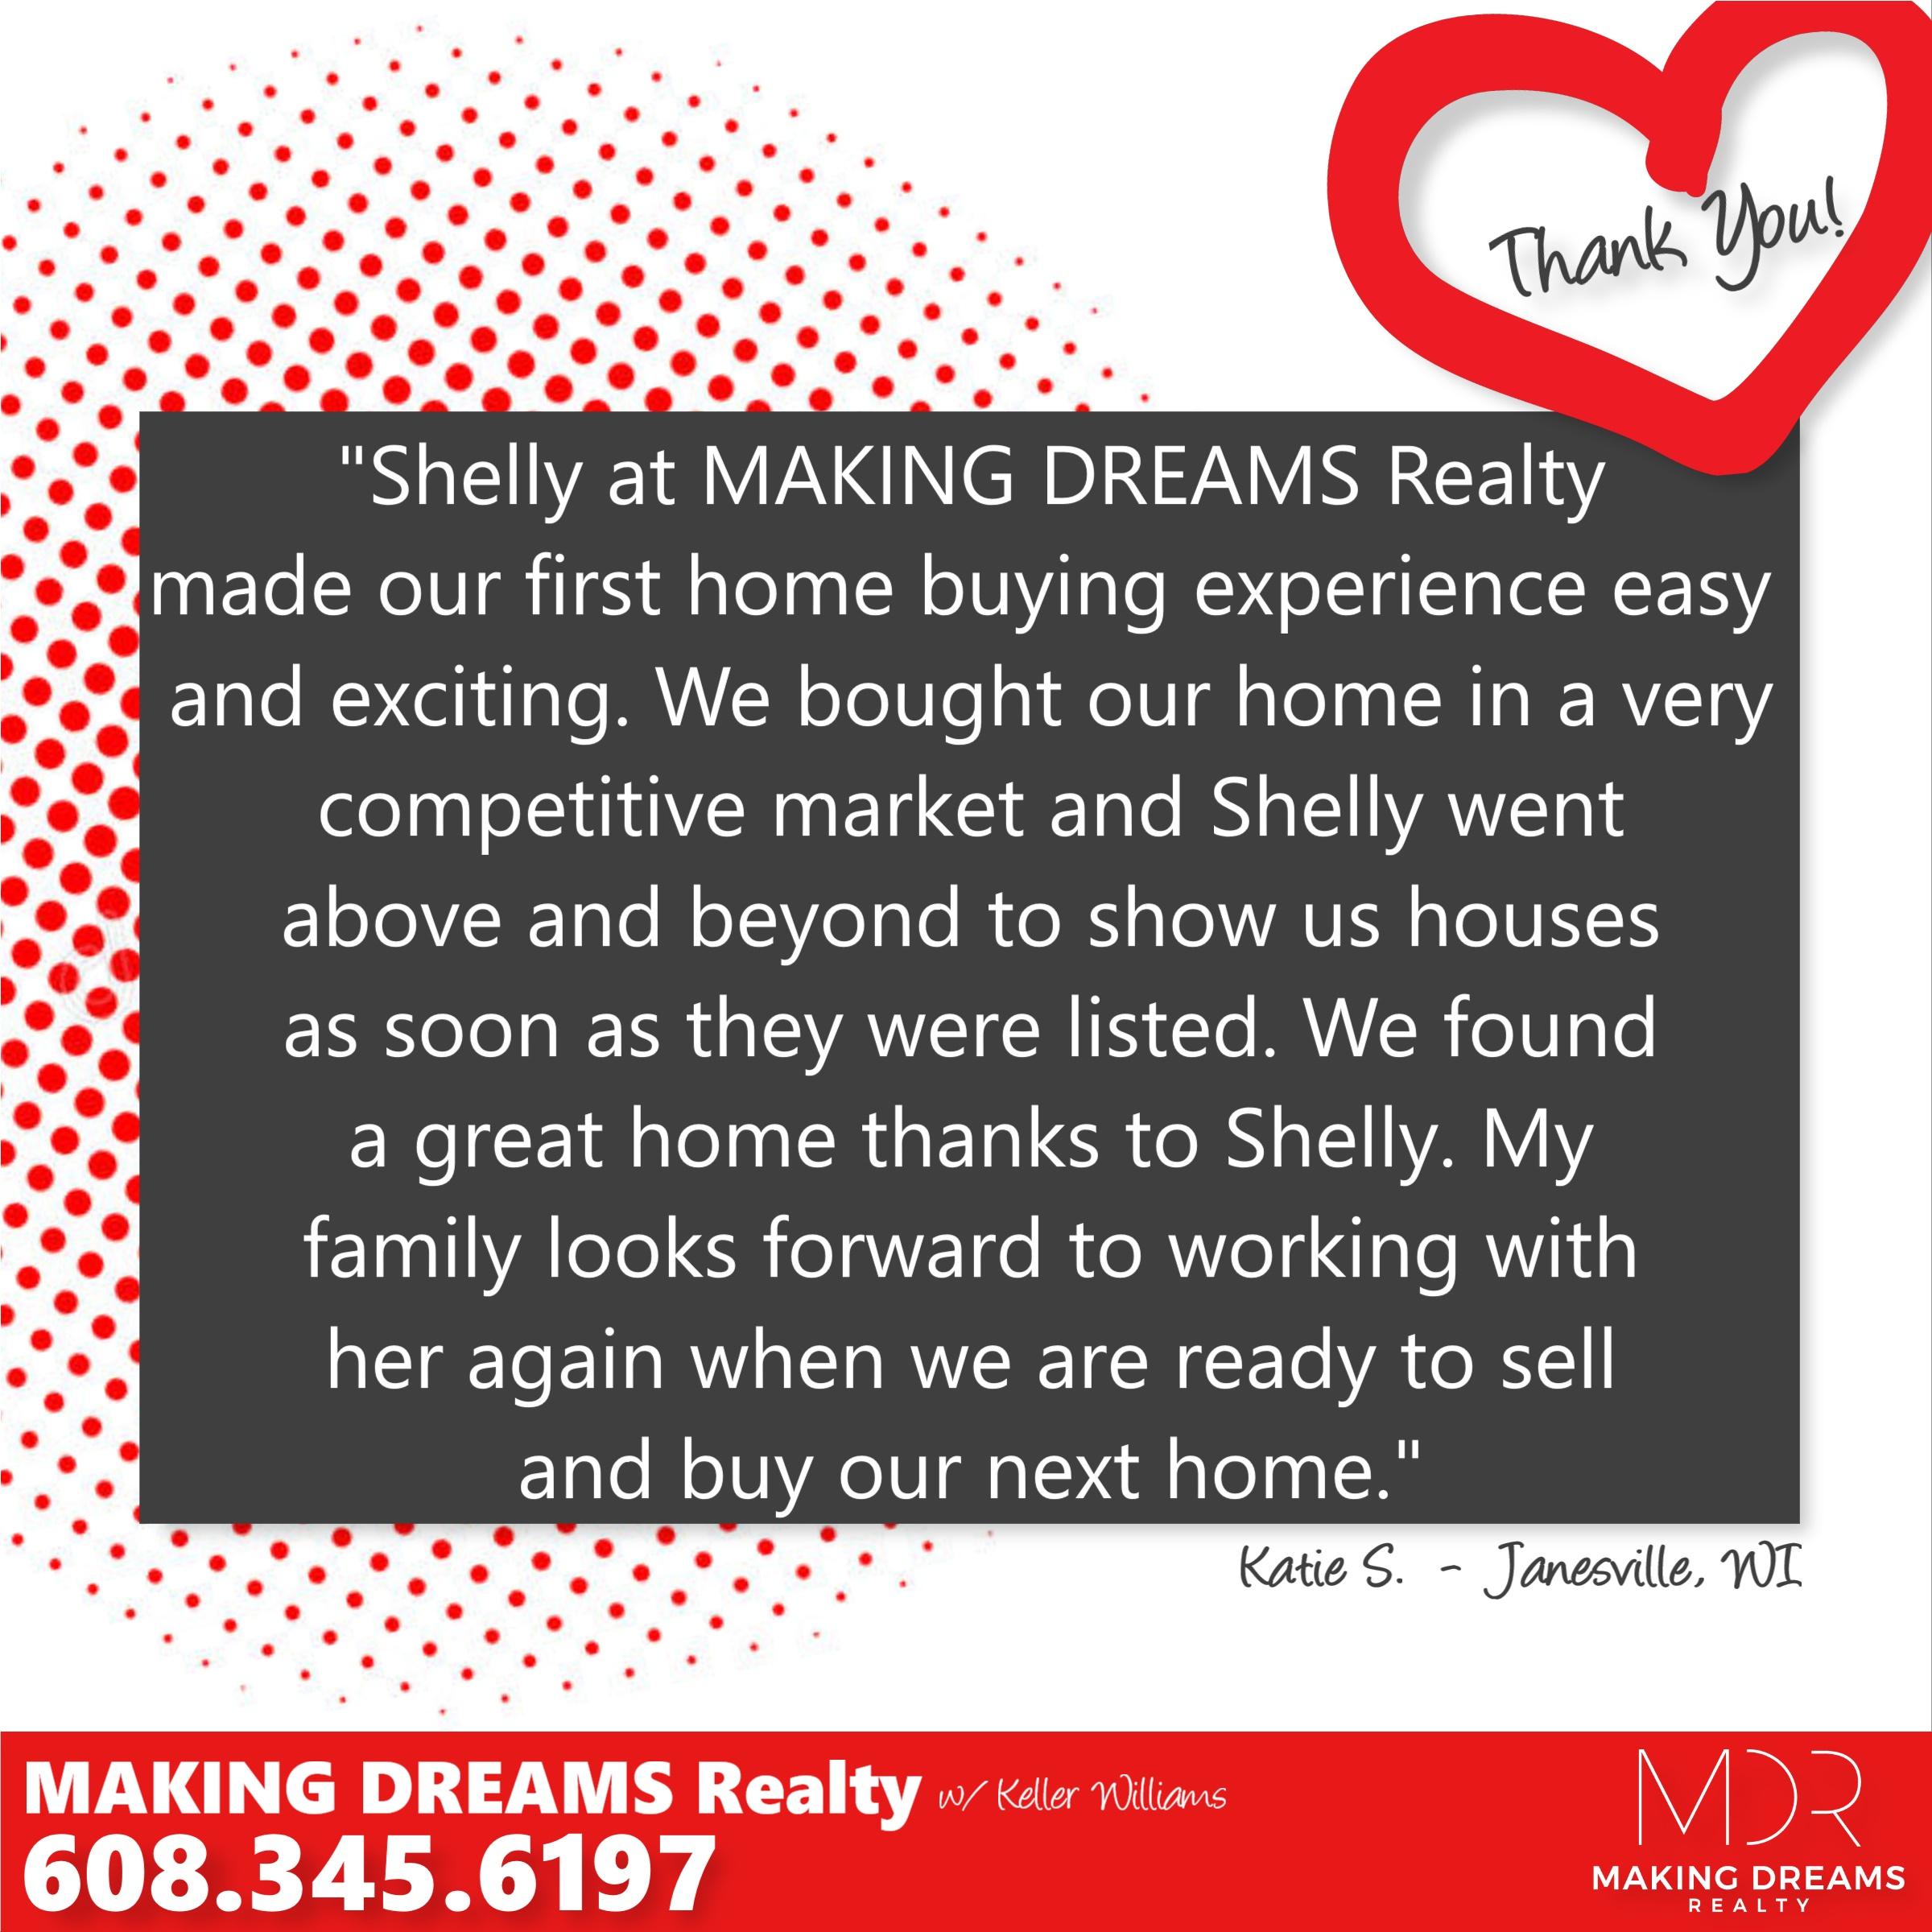 5 star buyer testimonial of MAKING DREAMS Realty